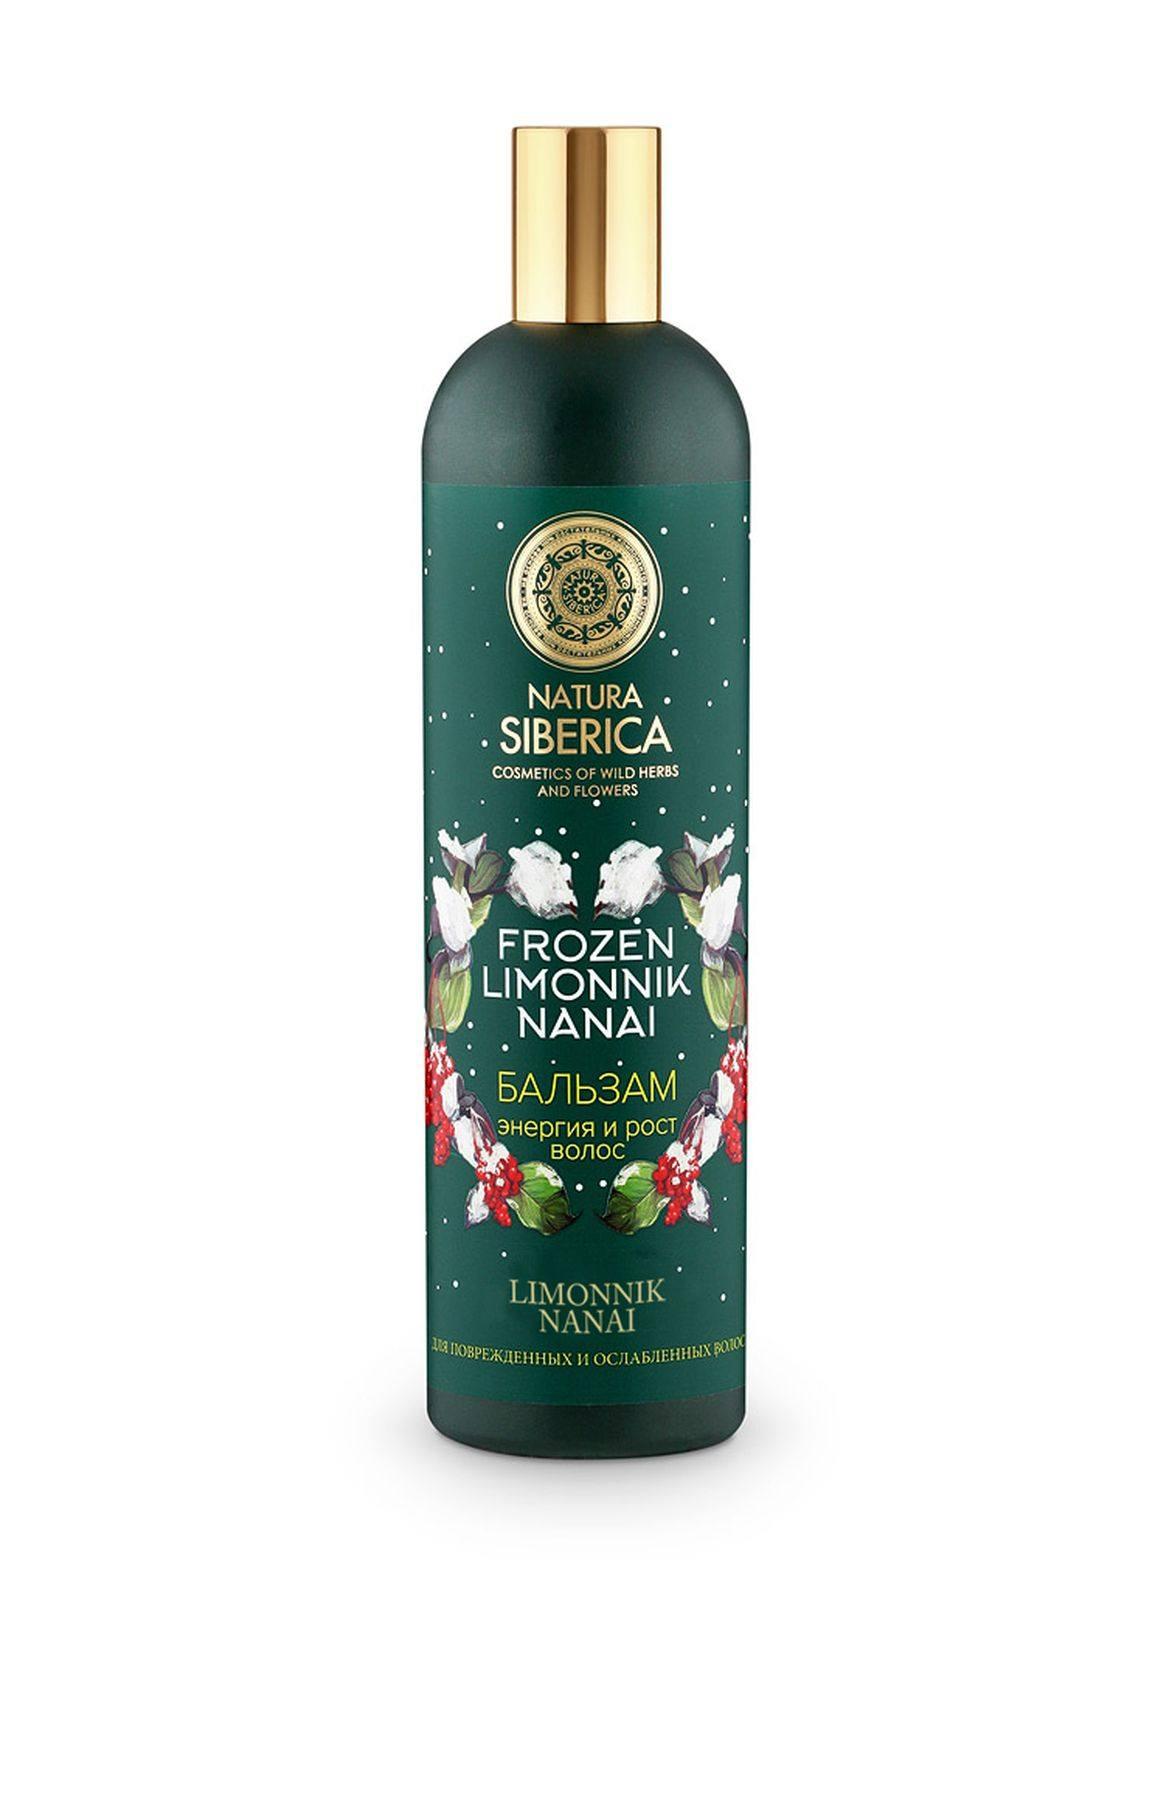 Natura Siberica Frozen limonnik nanai Бальзам Энергия и рост волос, 400 мл